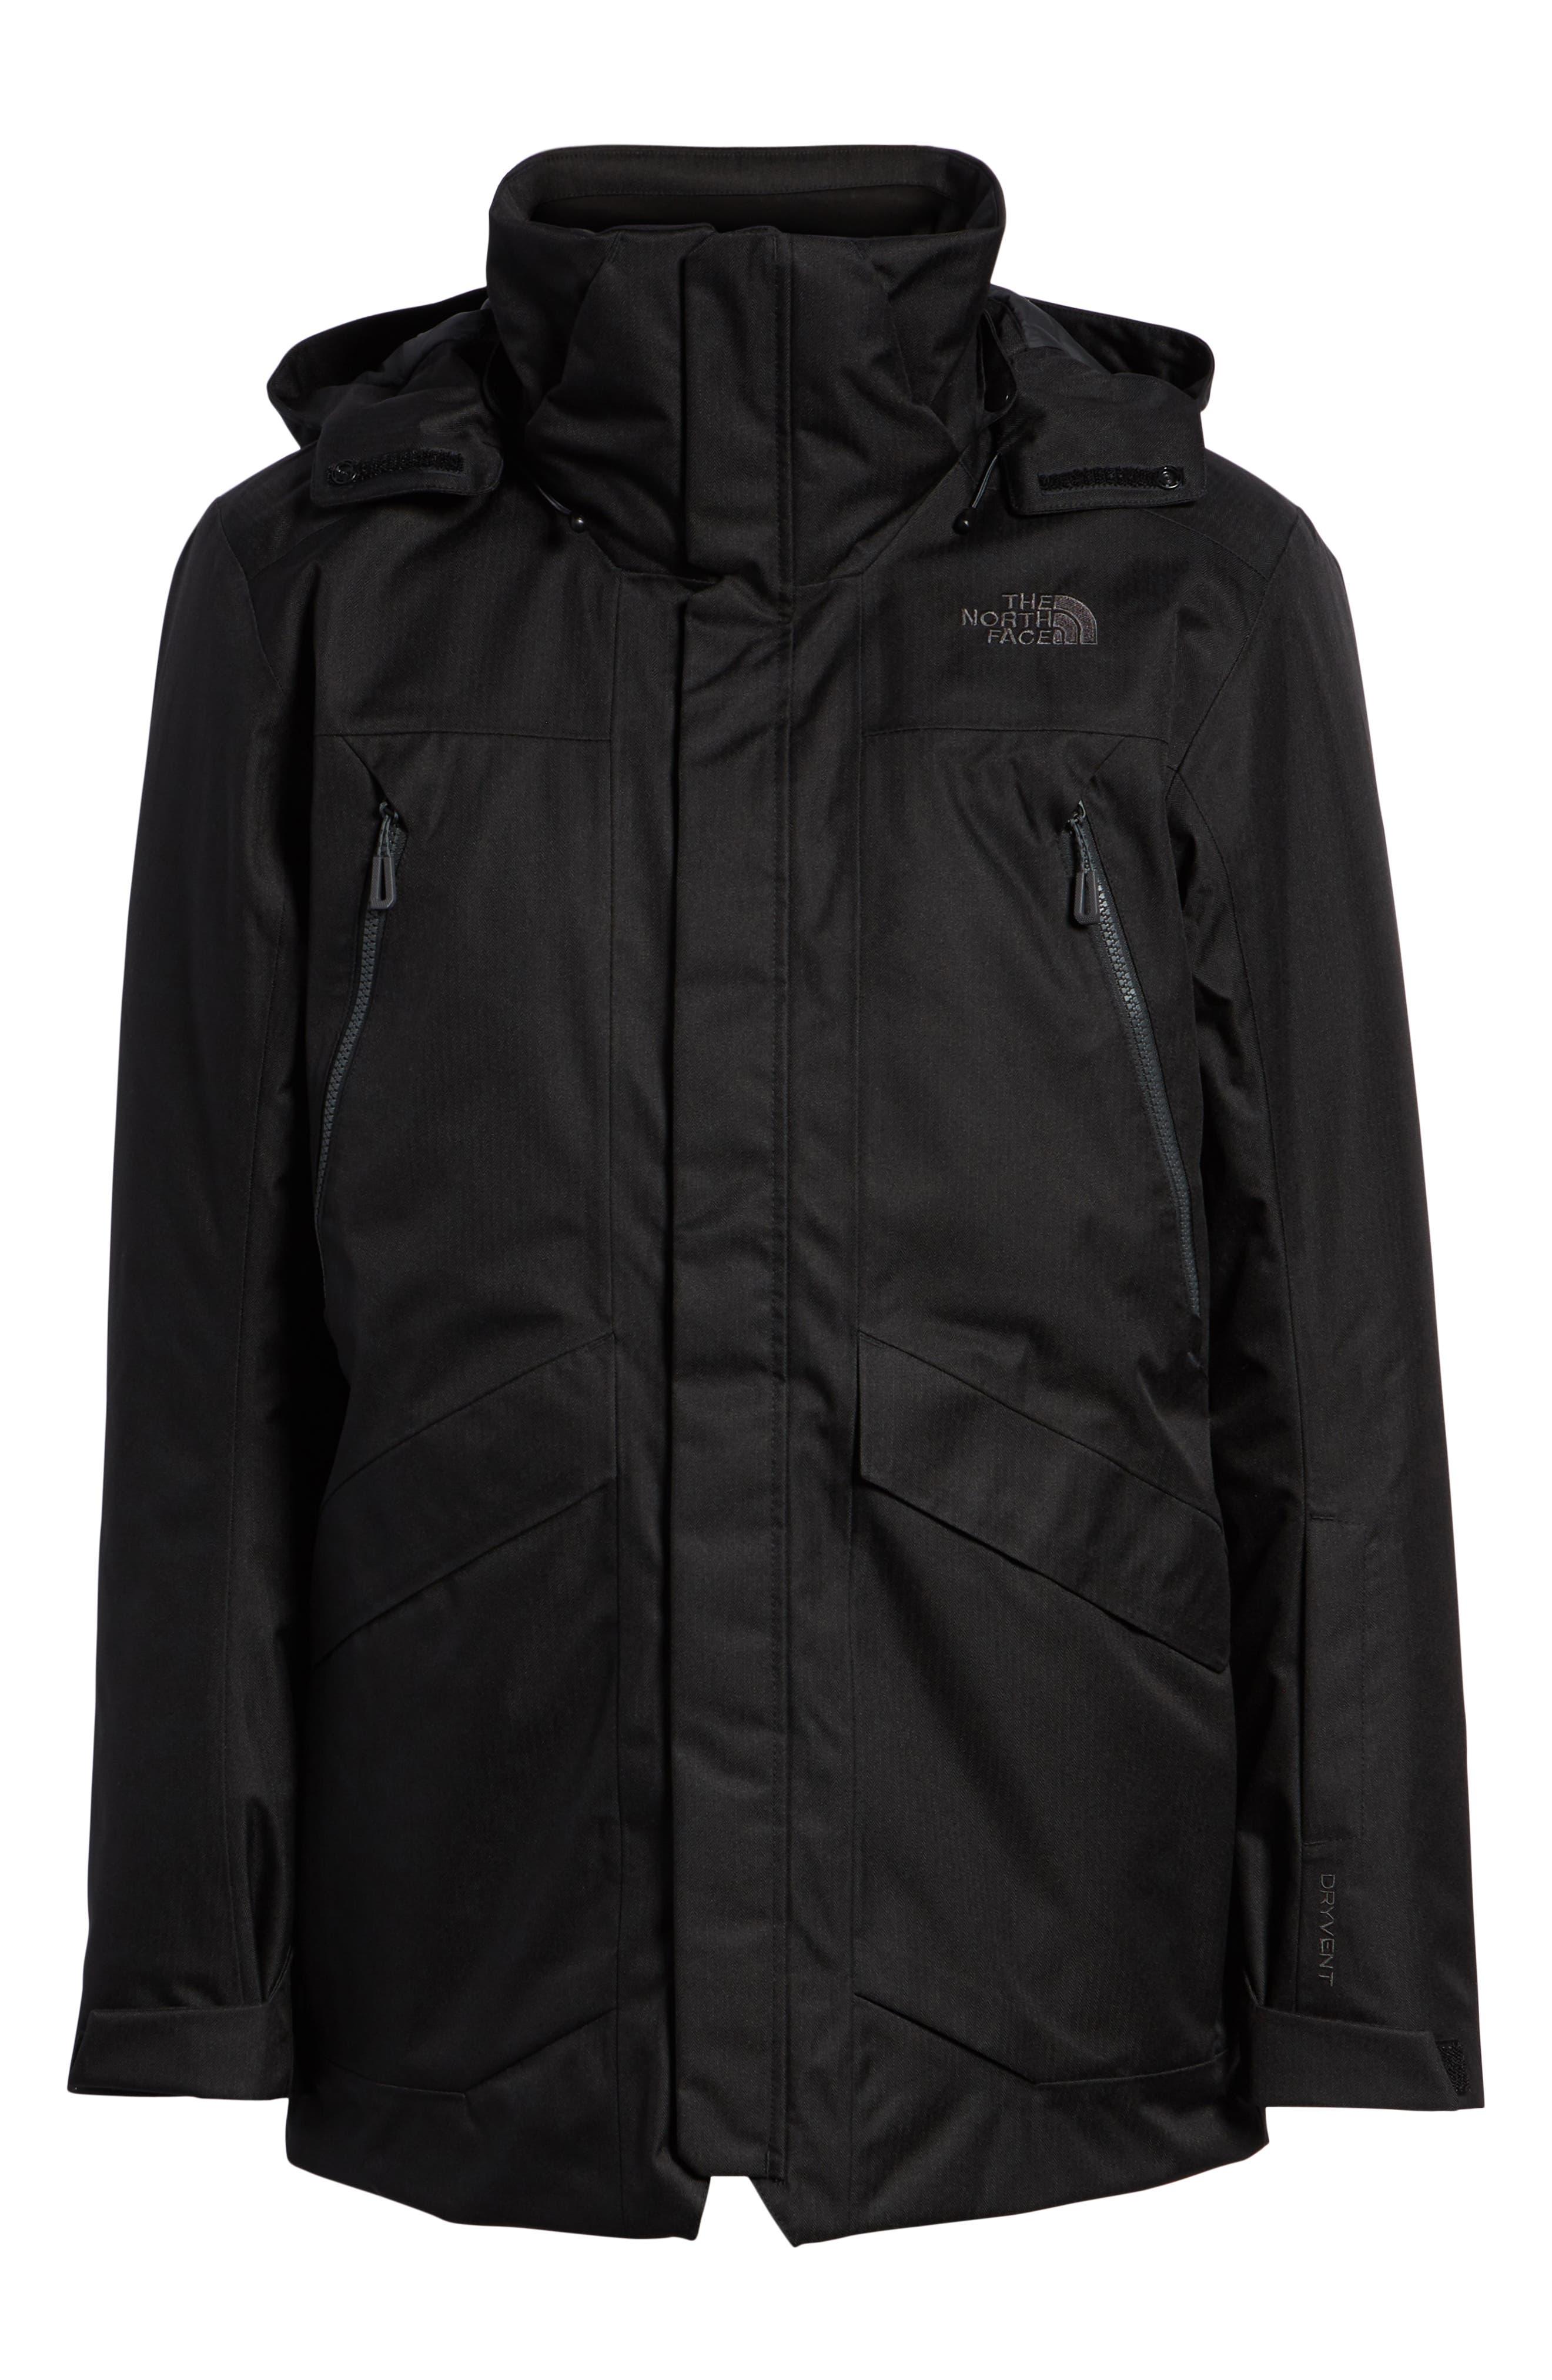 Gatekeeper Waterproof Jacket,                             Alternate thumbnail 6, color,                             TNF BLACK/TNF BLACK